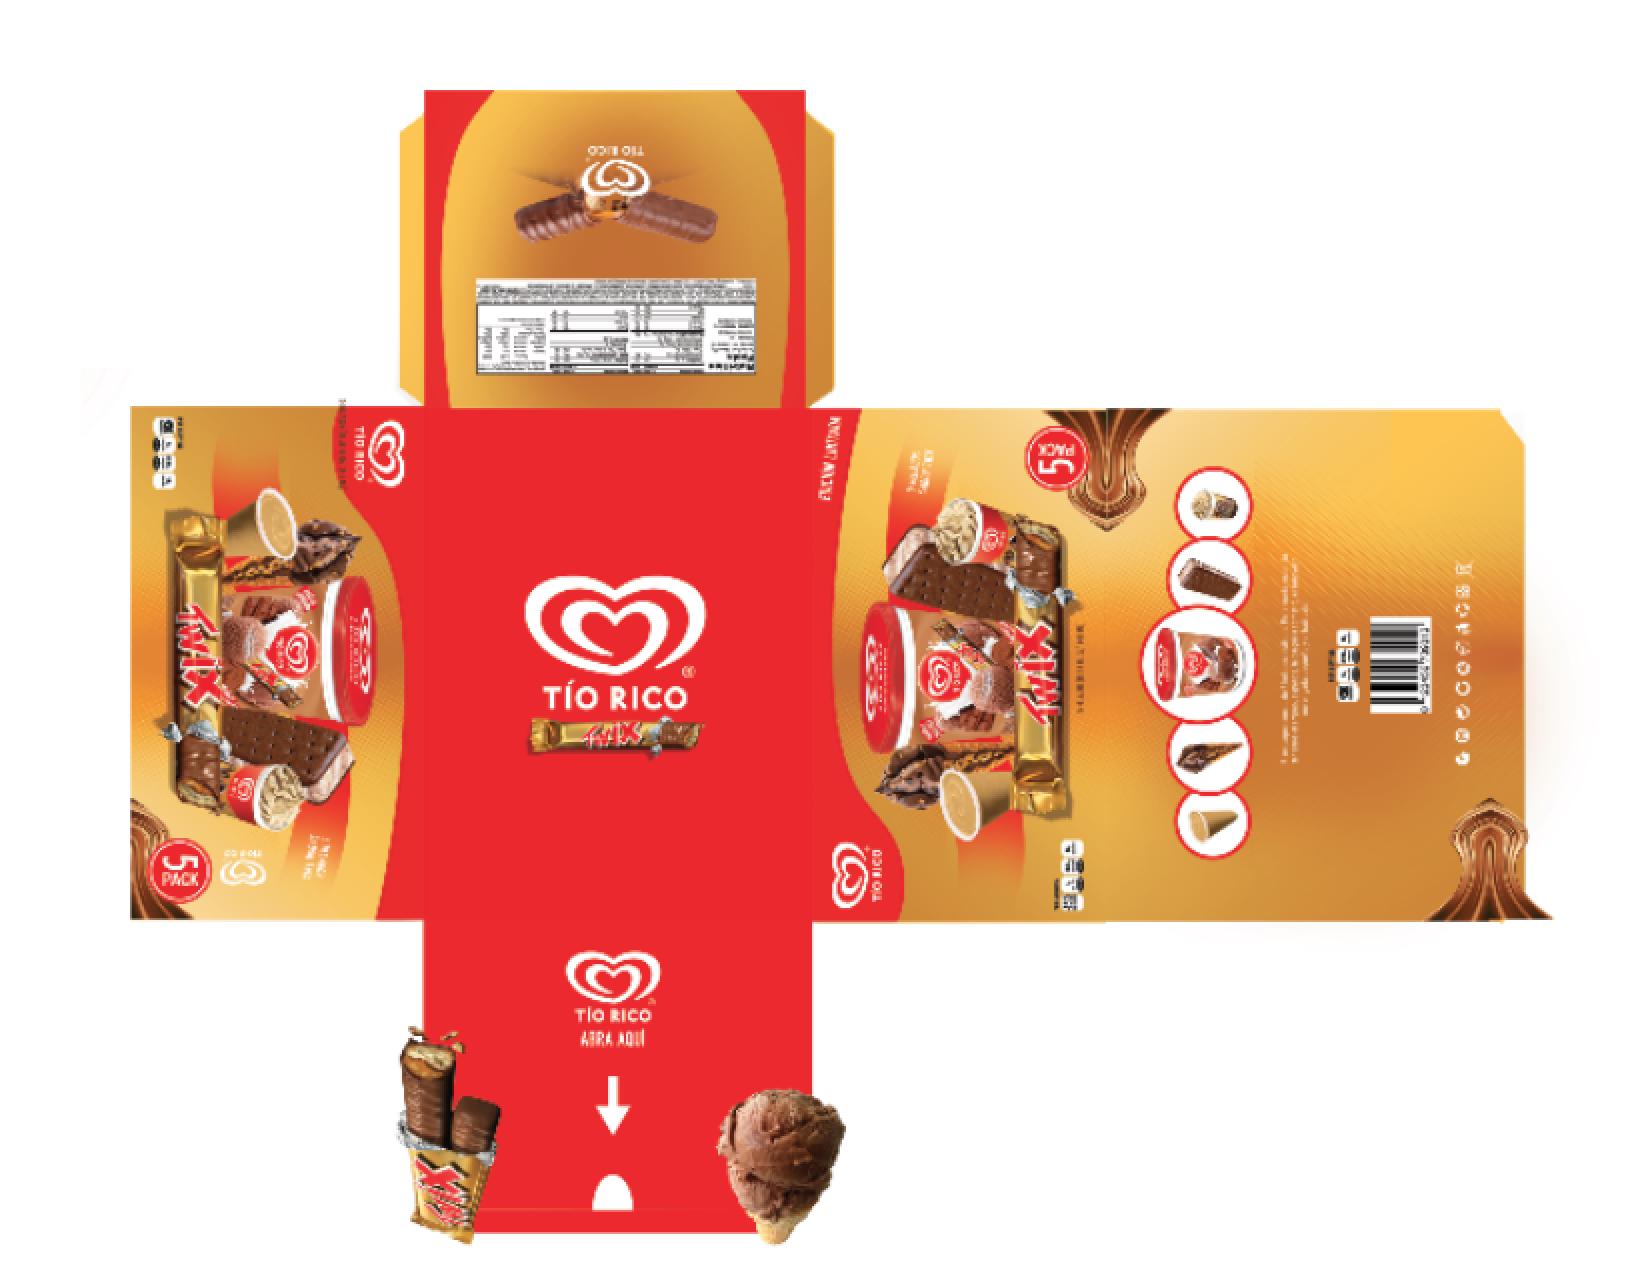 Tio Rico packaging design